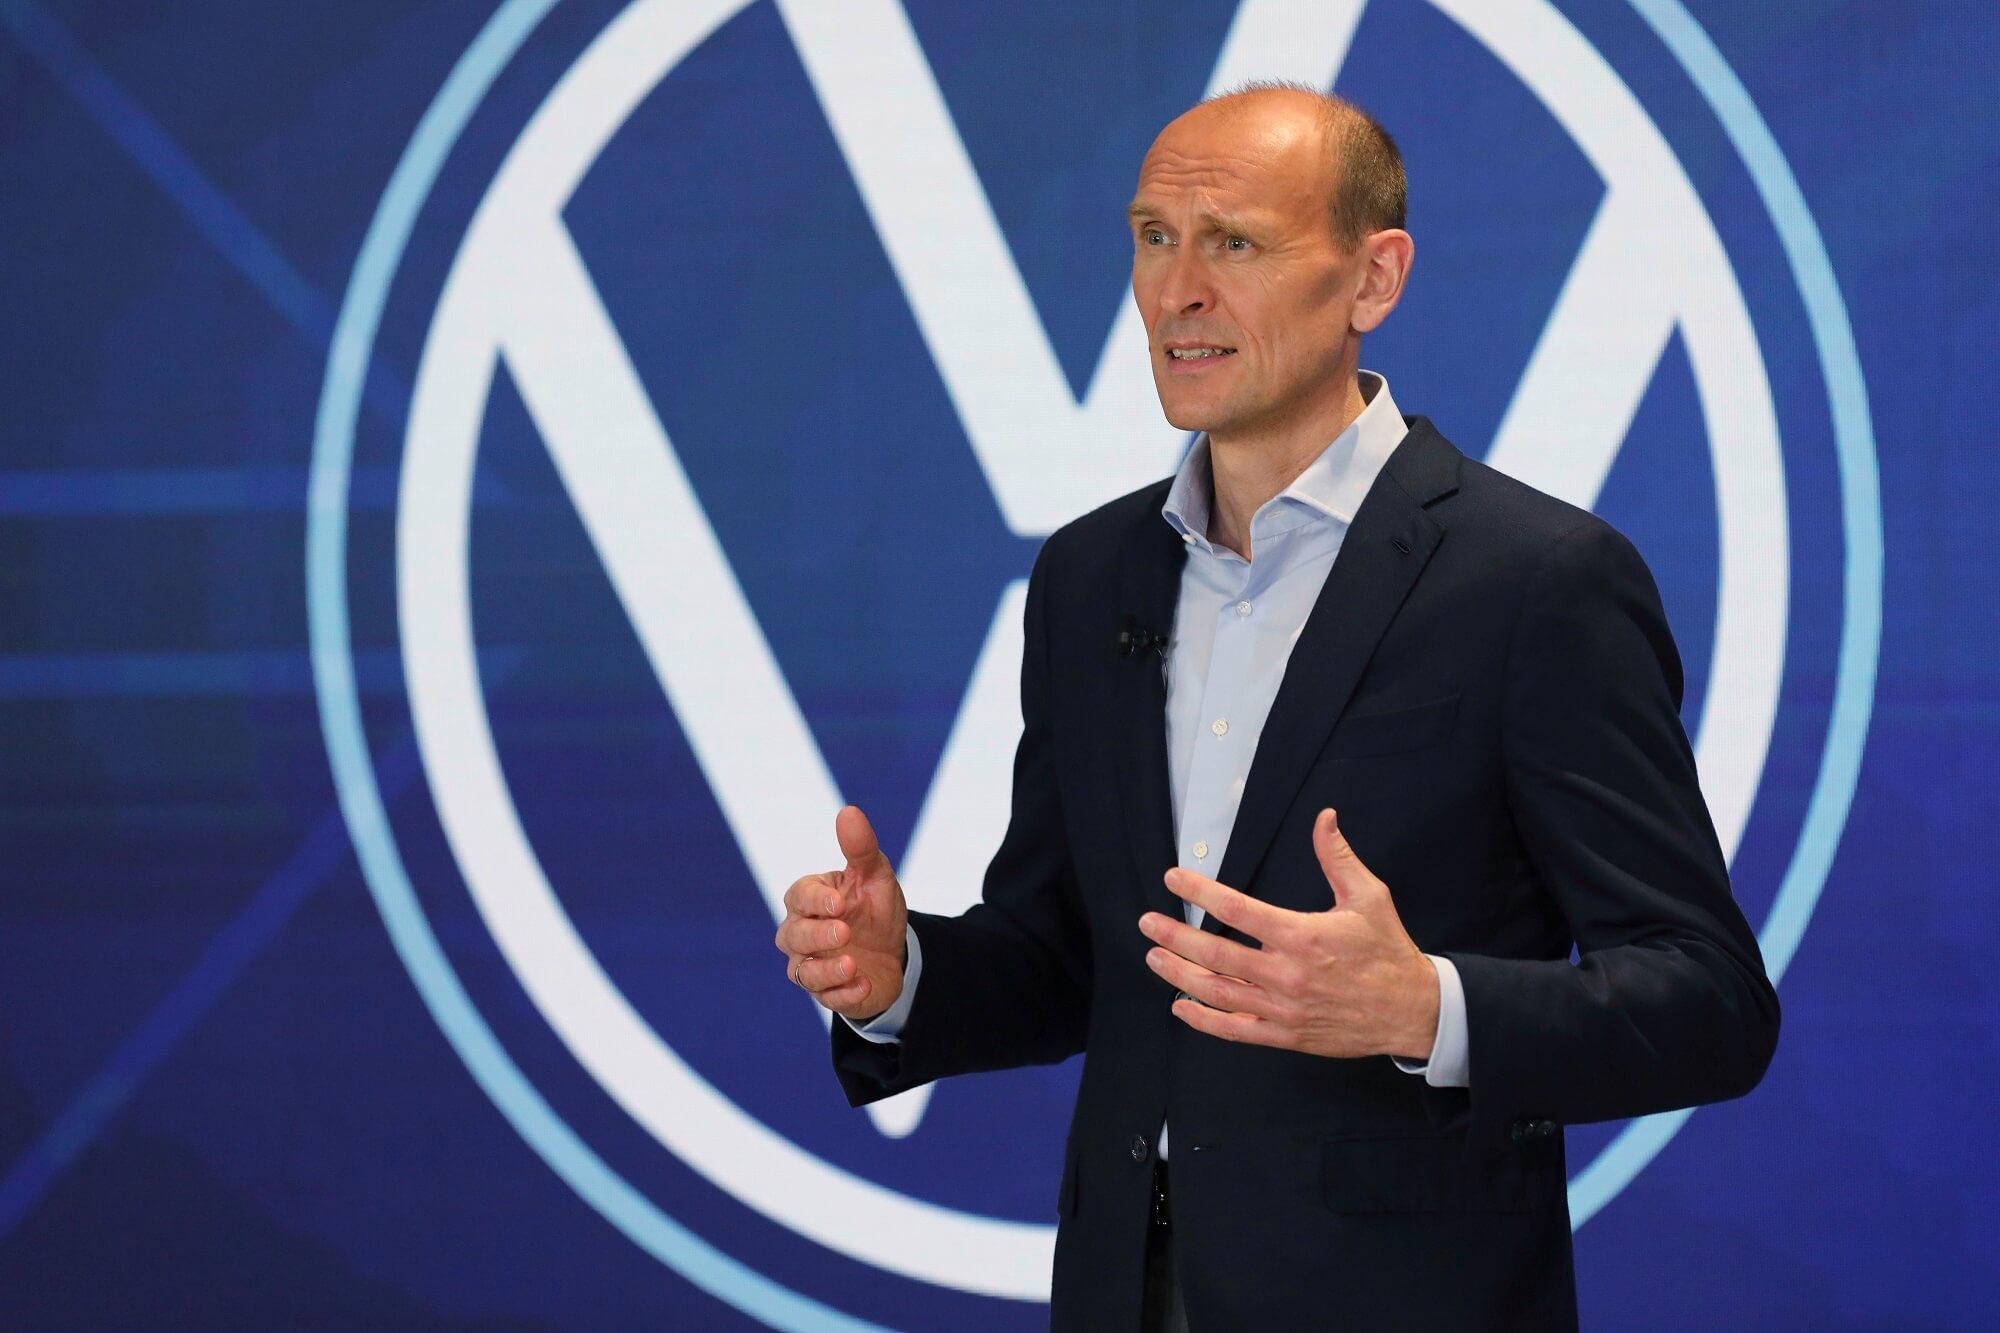 Ralf Brandstätter, CEO da Volkswagen